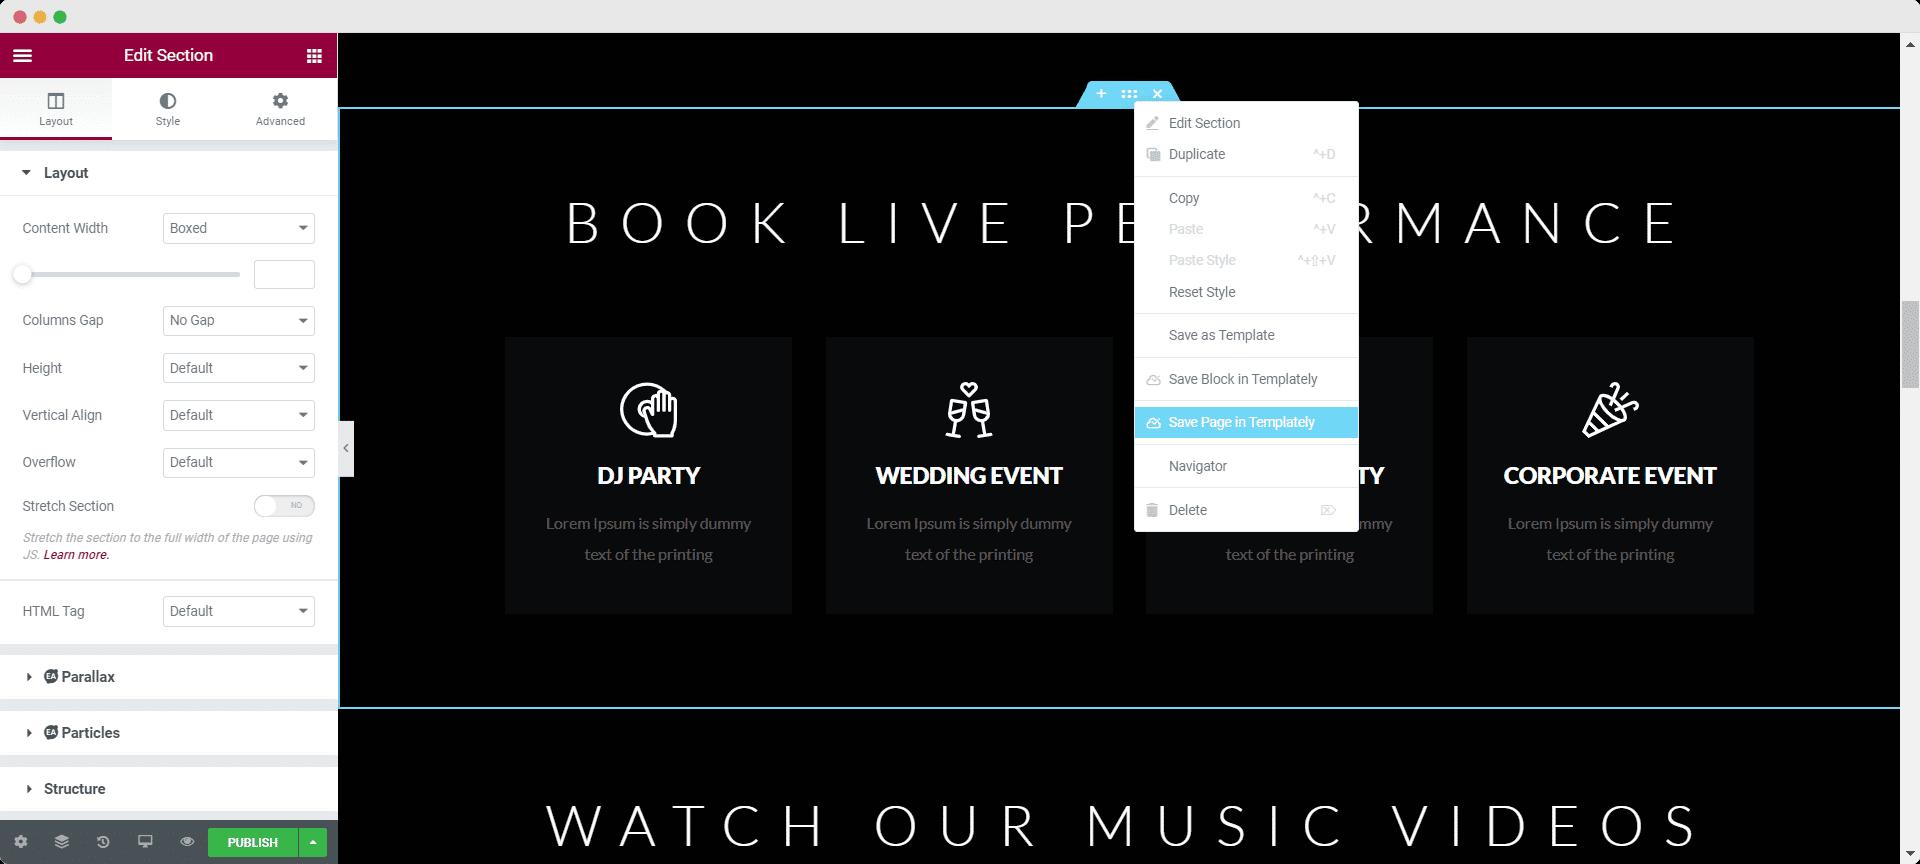 How To Create A Musician Online Portfolio Using FREE WordPress Template [No Coding] 3